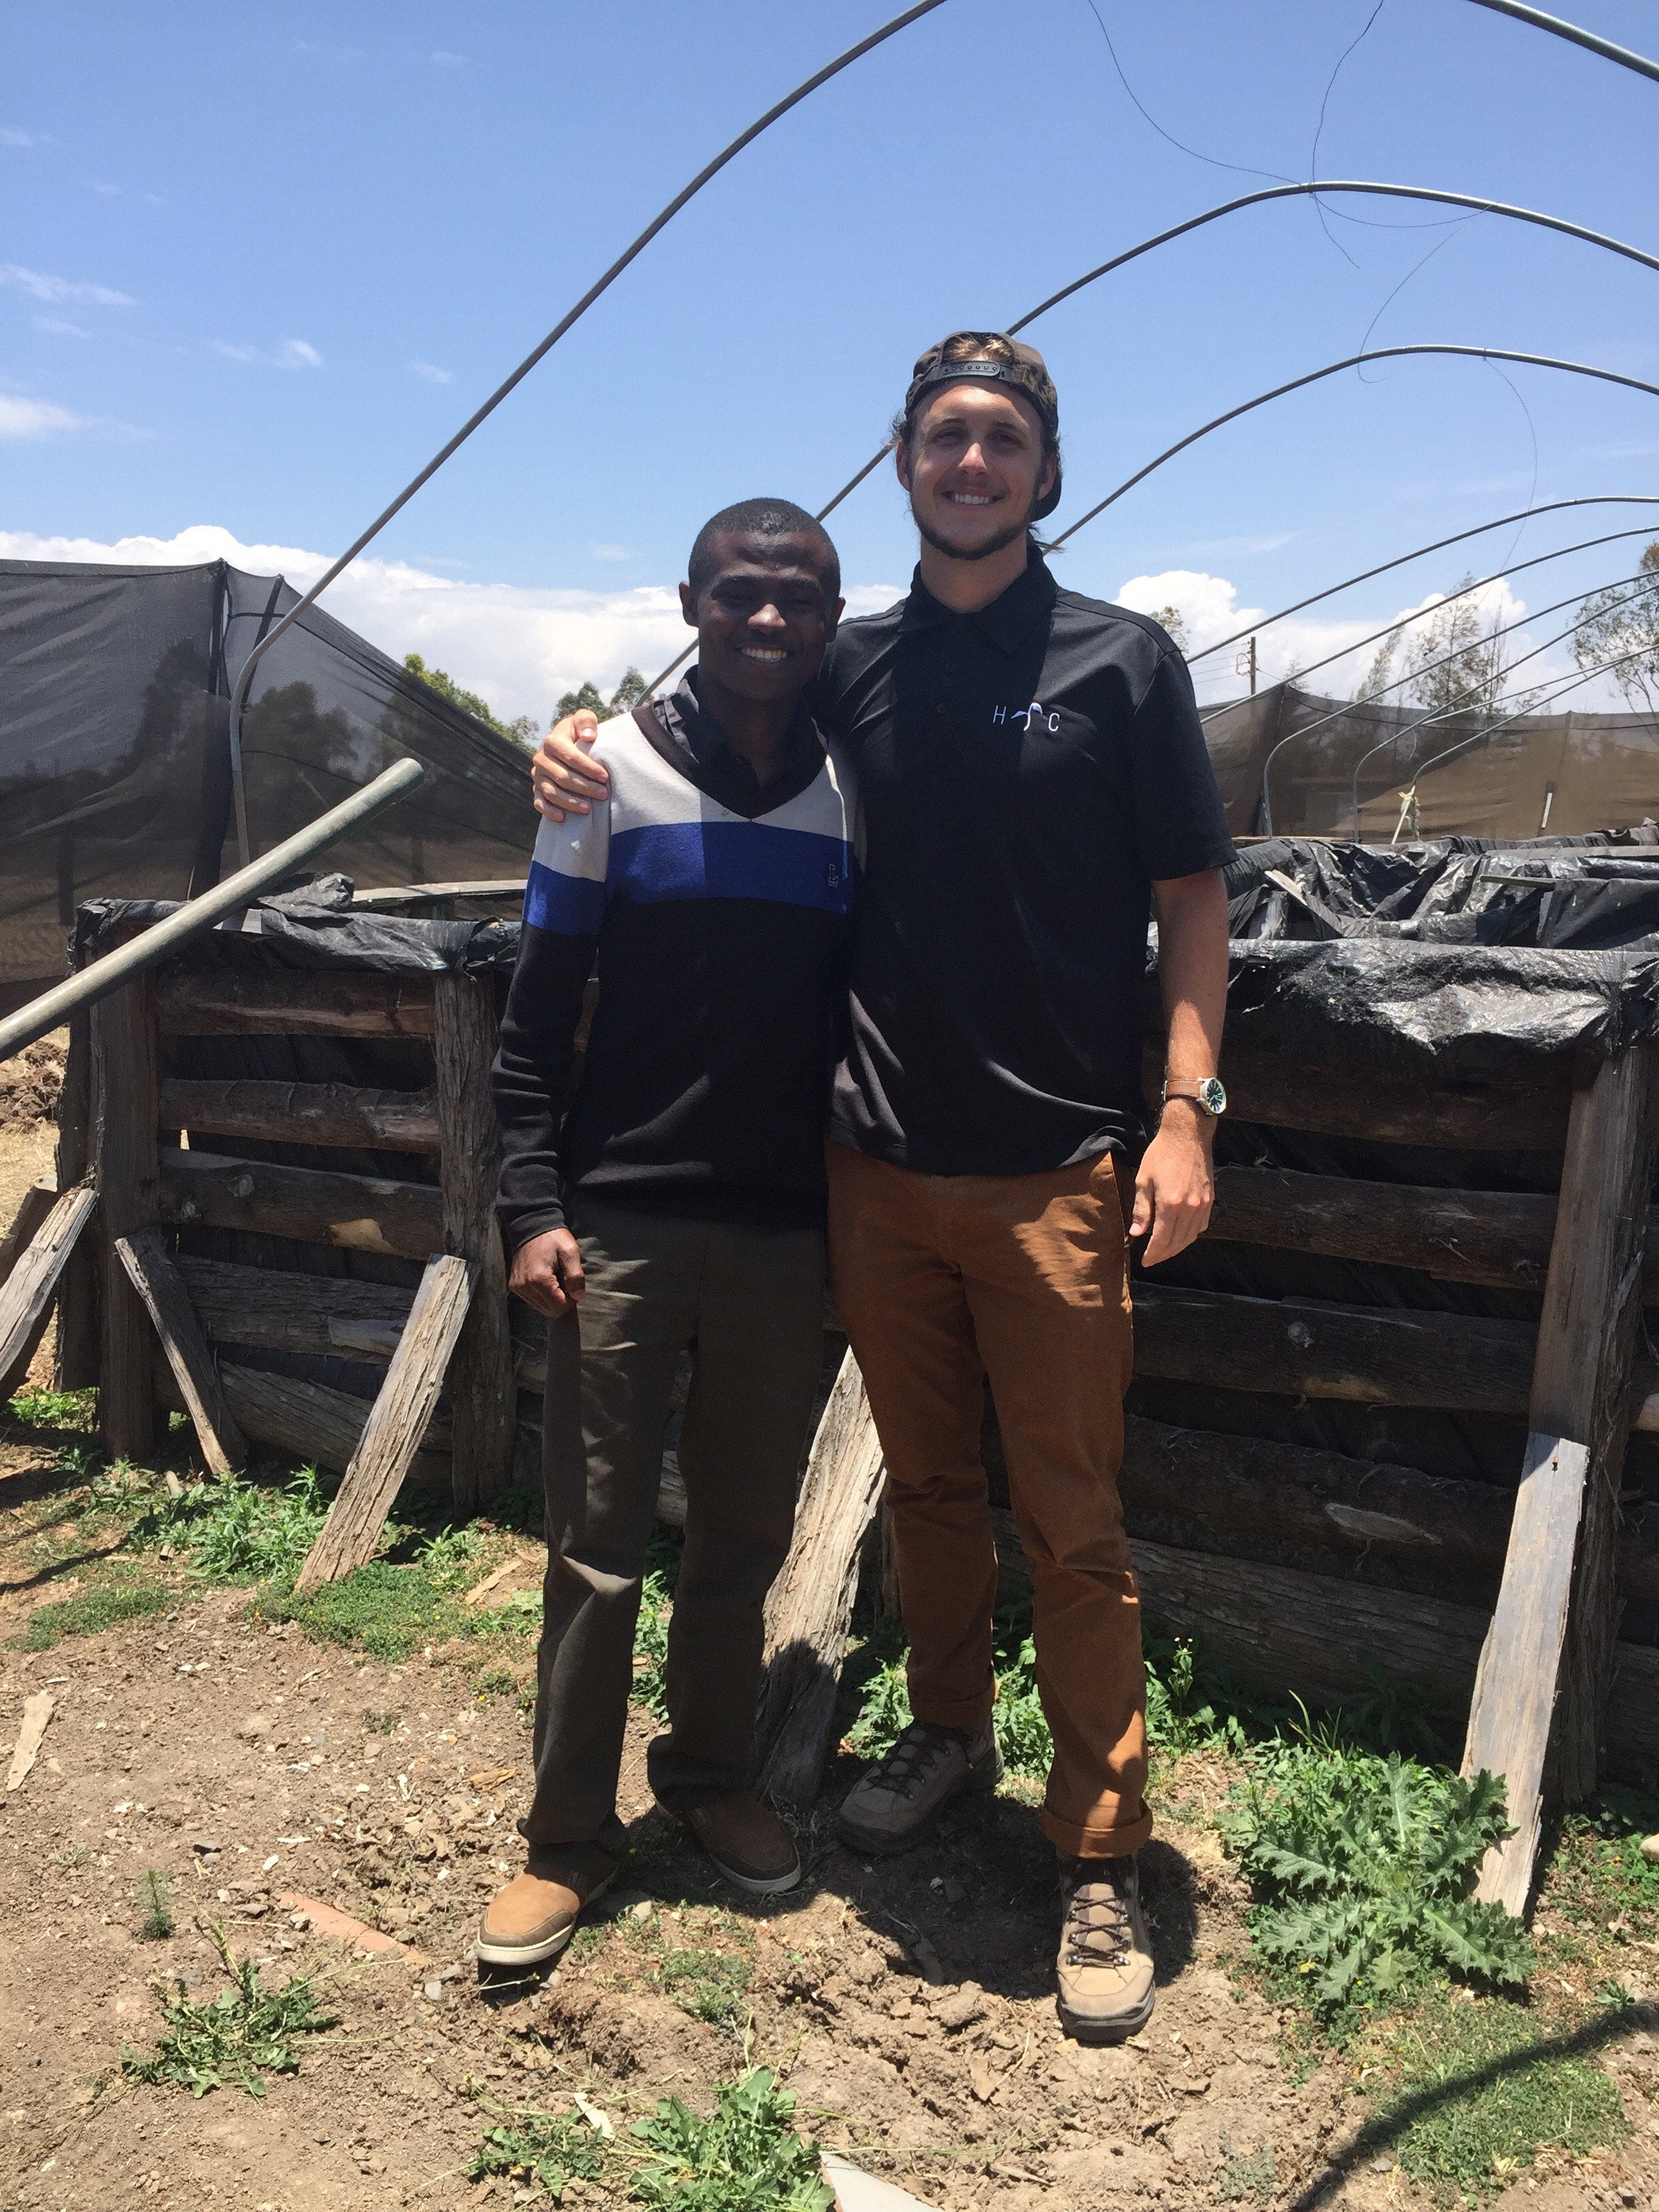 Geoff and Mavin, one of HC's community partners in Kenya.